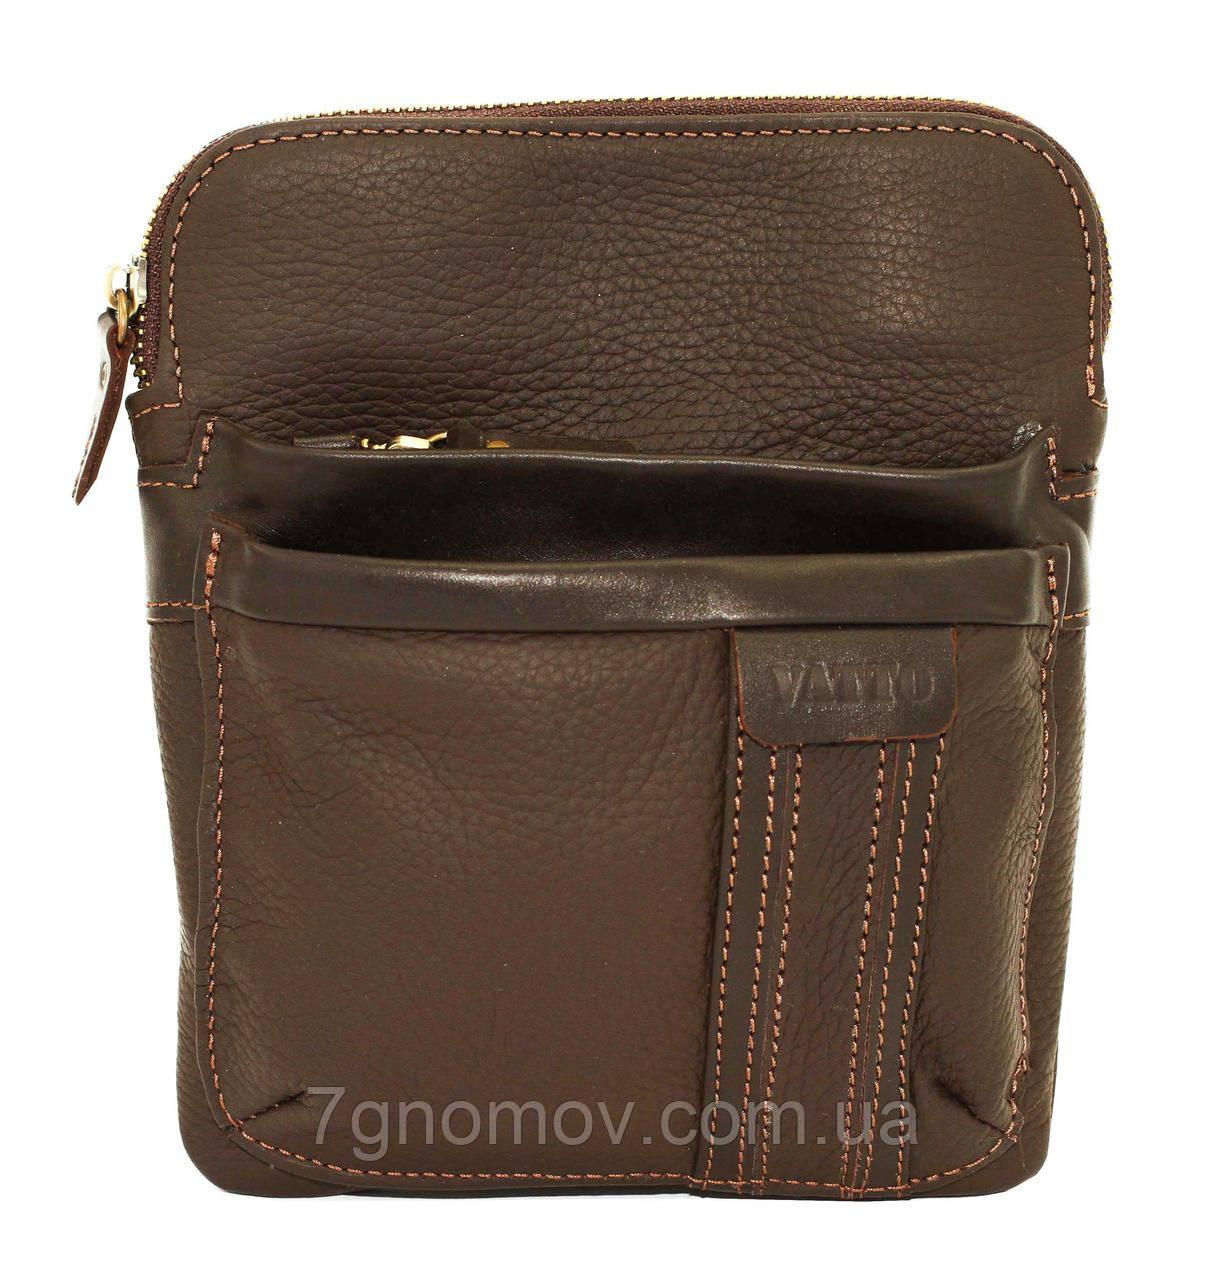 Мужская сумка VATTO Mk54 F7Kаz400